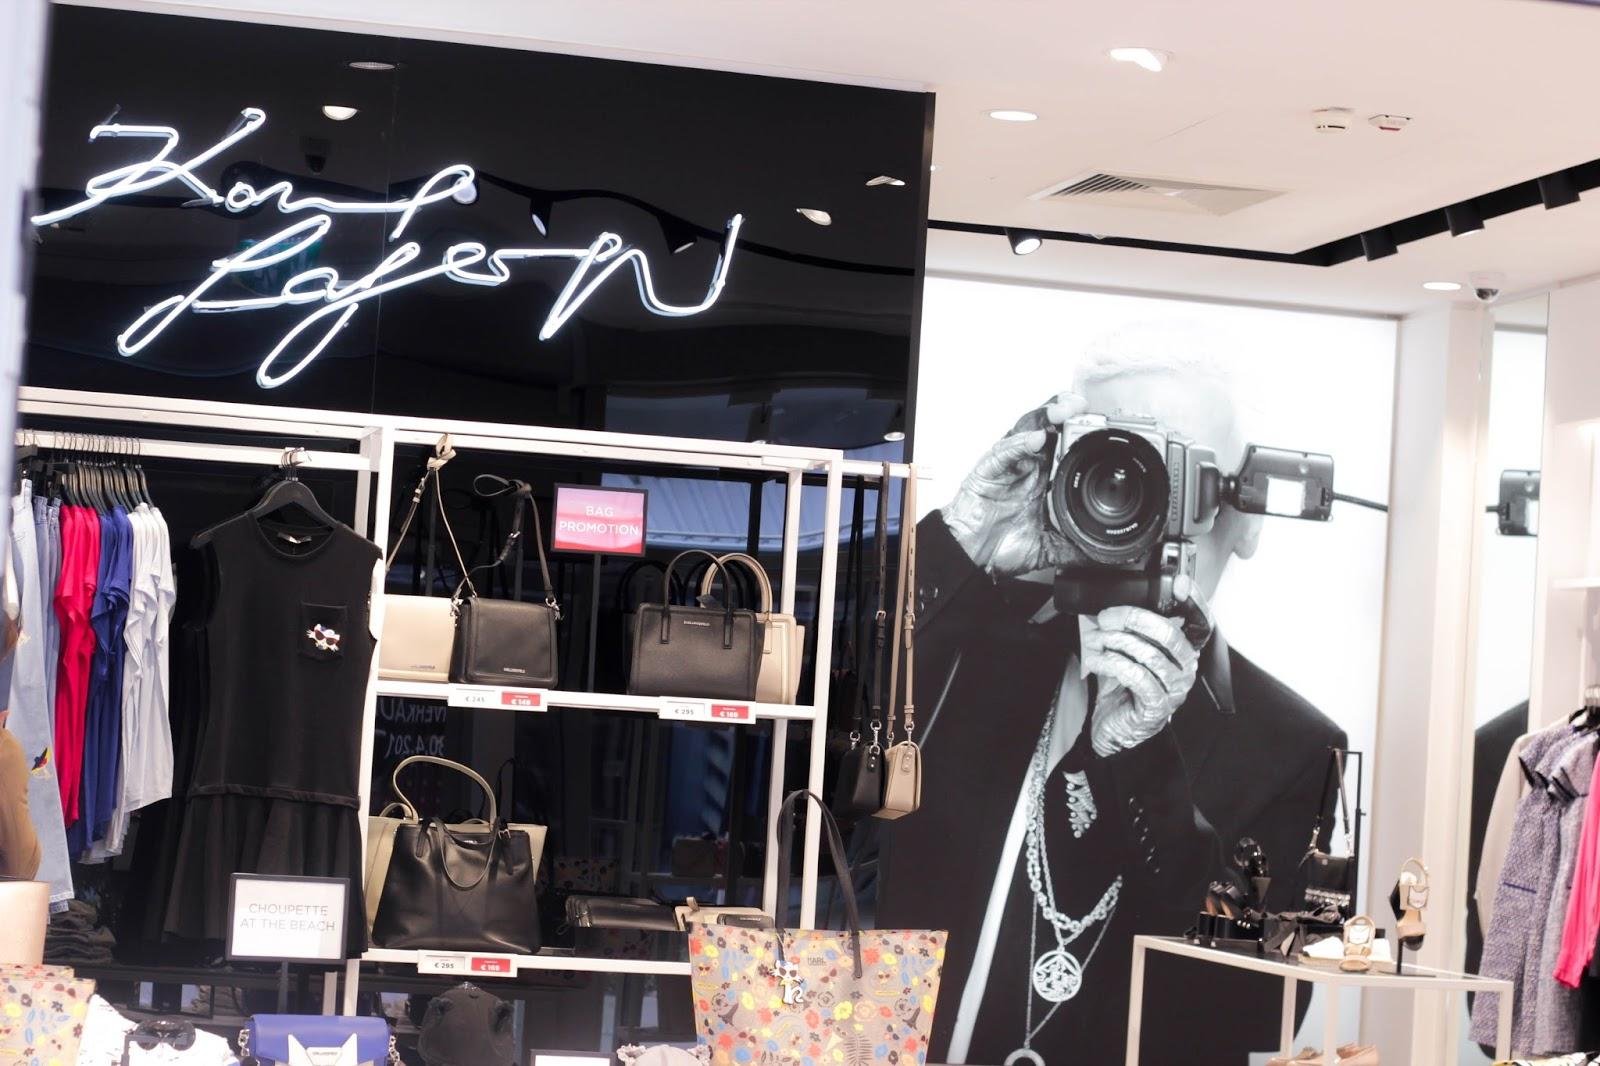 Outlet Shopping in Zweibrücken - Karl Lagerfeld